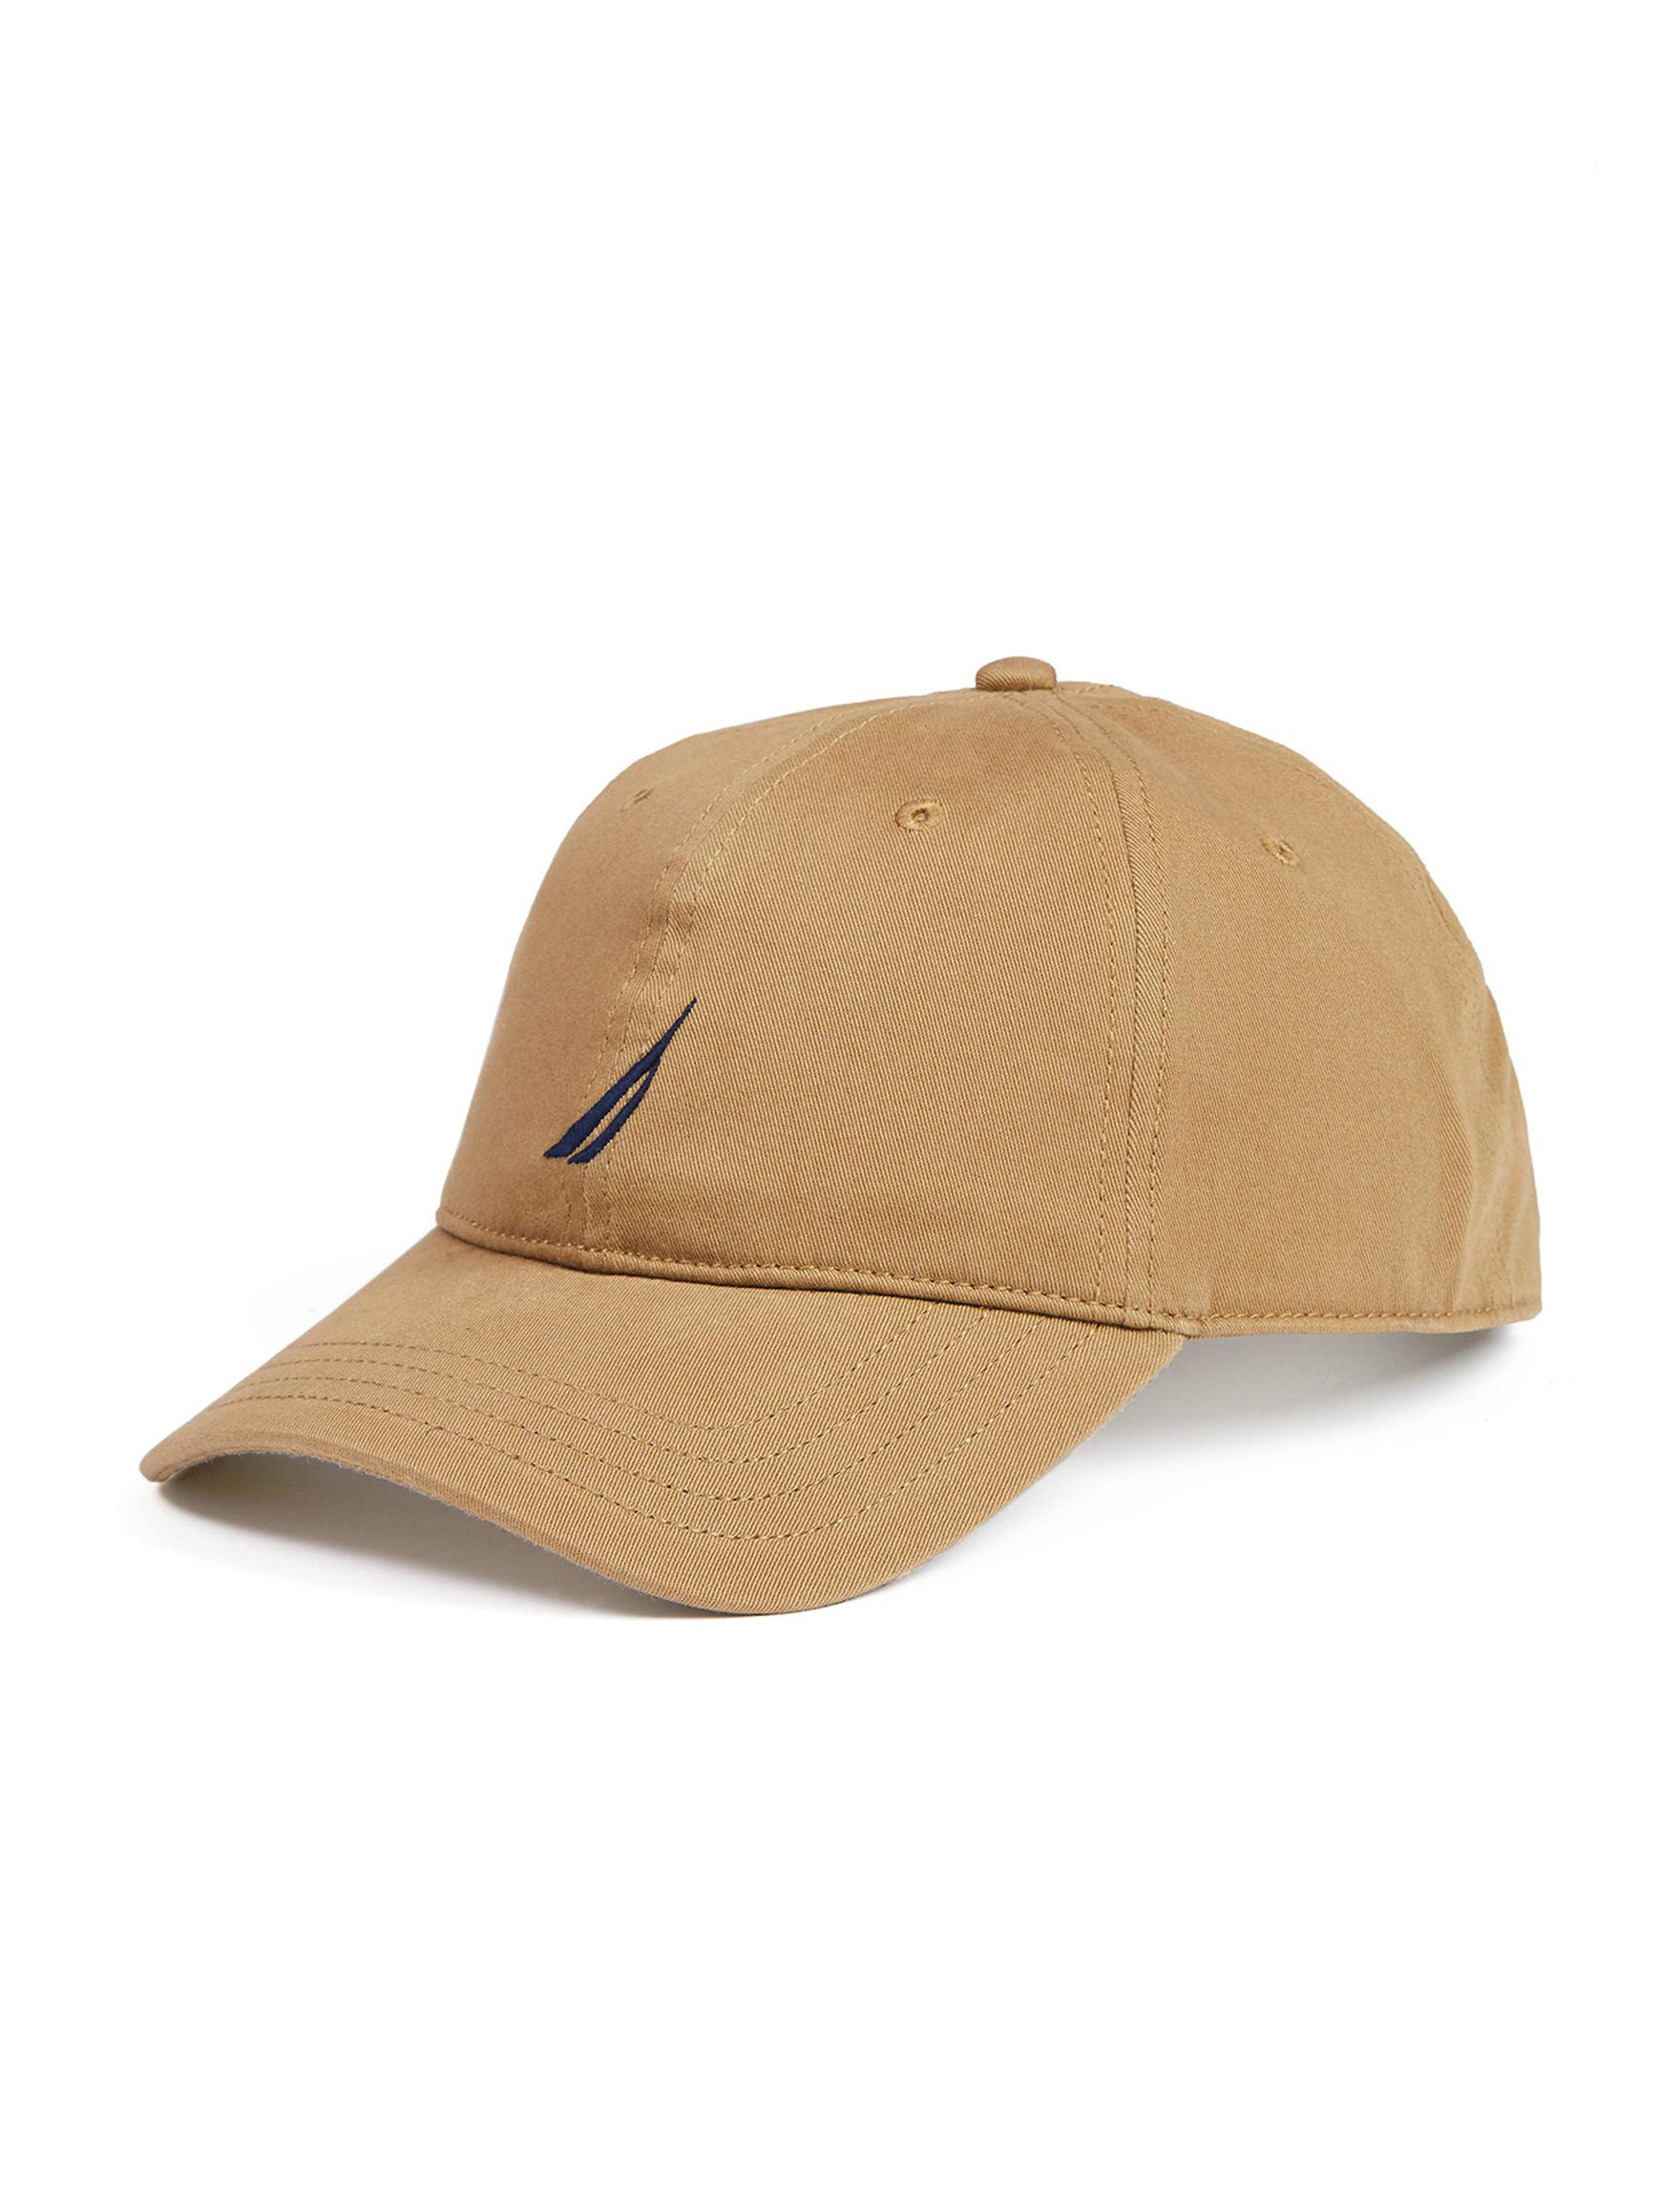 Nautica Brown Hats & Headwear